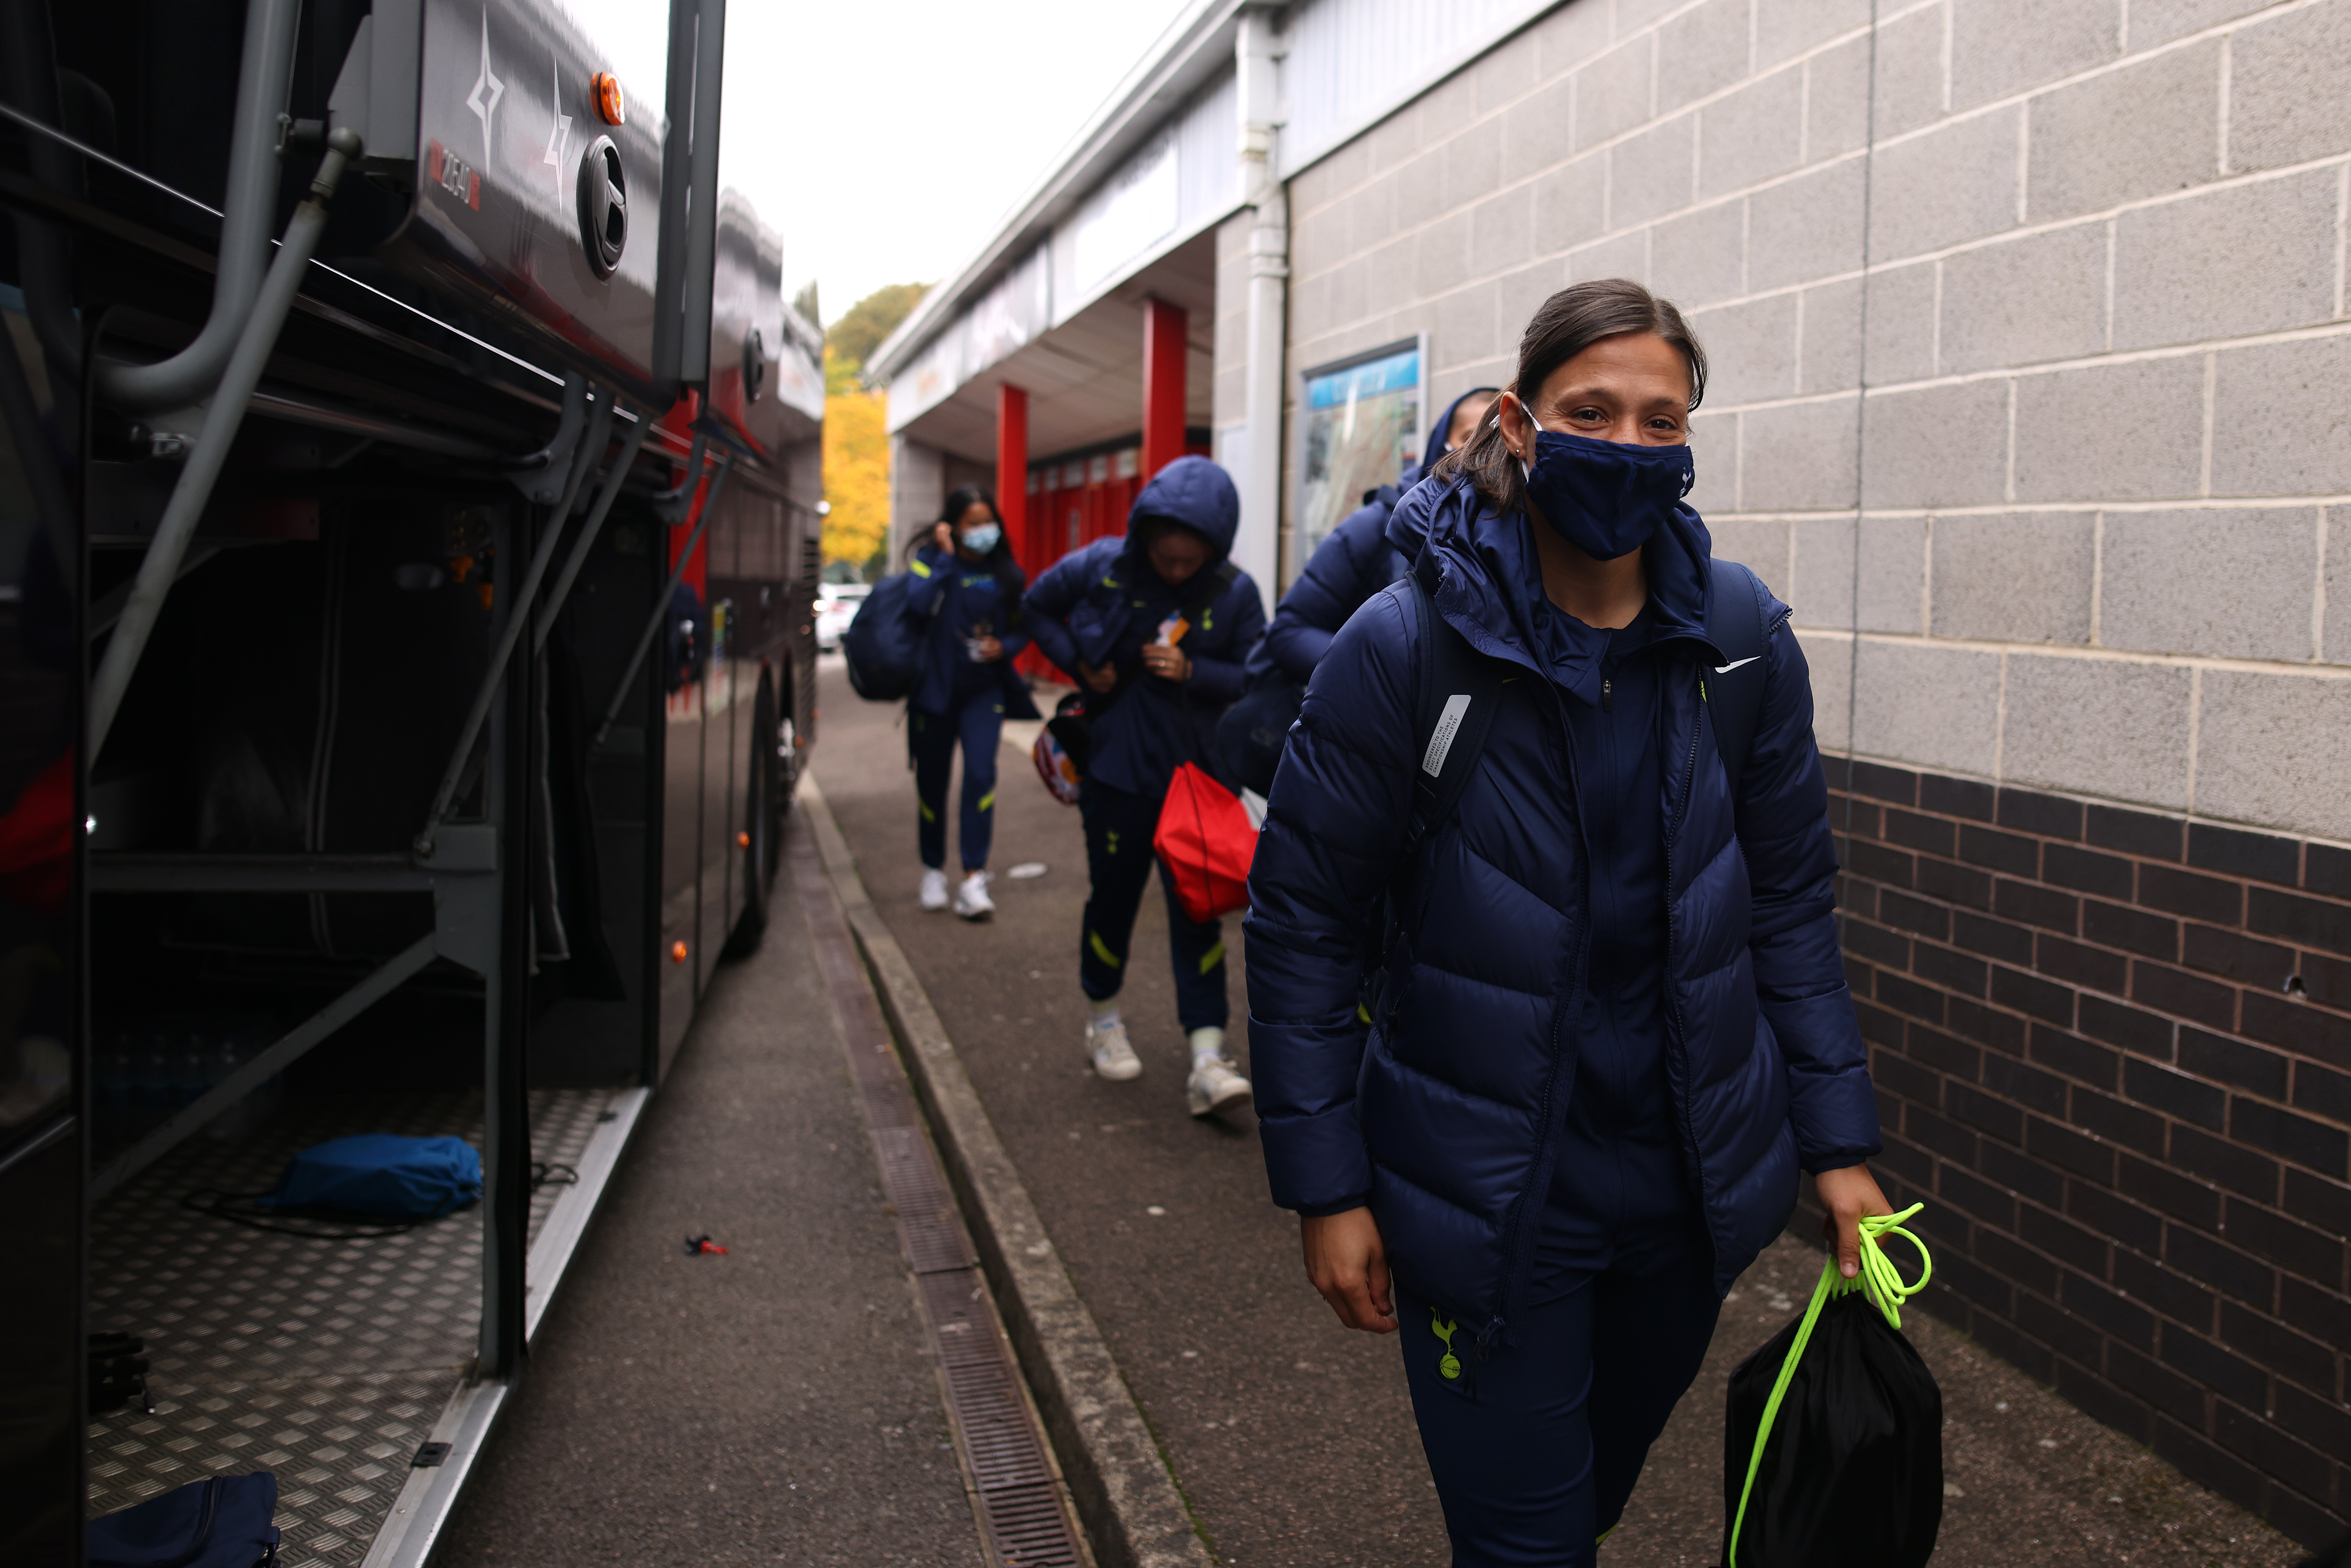 Brighton & Hove Albion Women v Tottenham Hotspur Women - Barclays FA Women's Super League